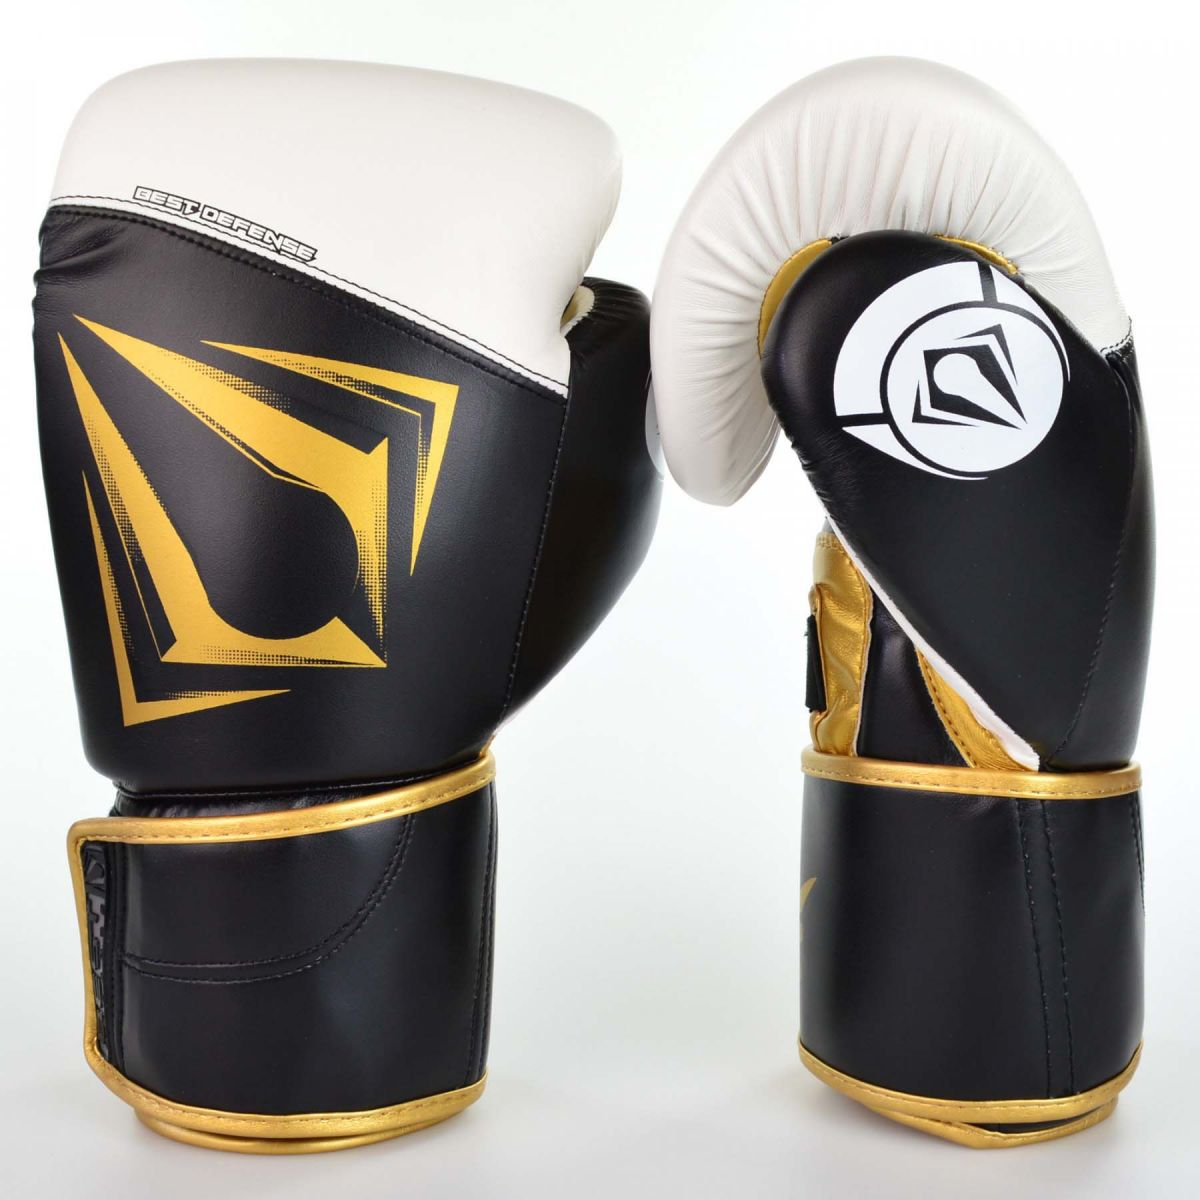 Luvas Boxe / Muay Thai - Spartan - Best Defense - Preto / Branco - 10/12/14OZ